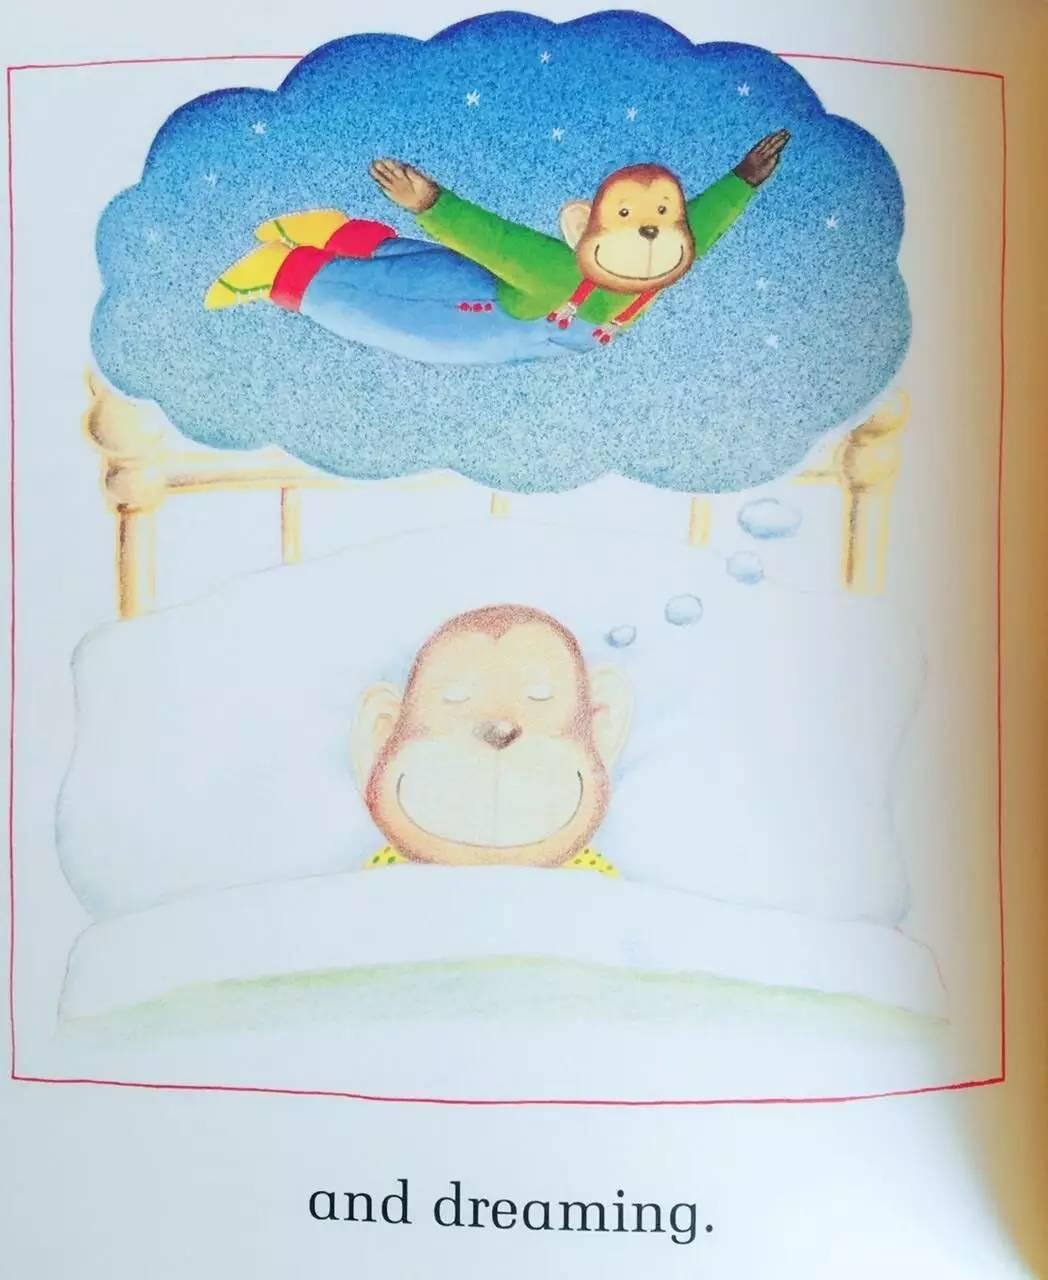 Things I Like 我喜欢的一切 -第19张图片-58绘本网-专注儿童绘本批发销售。